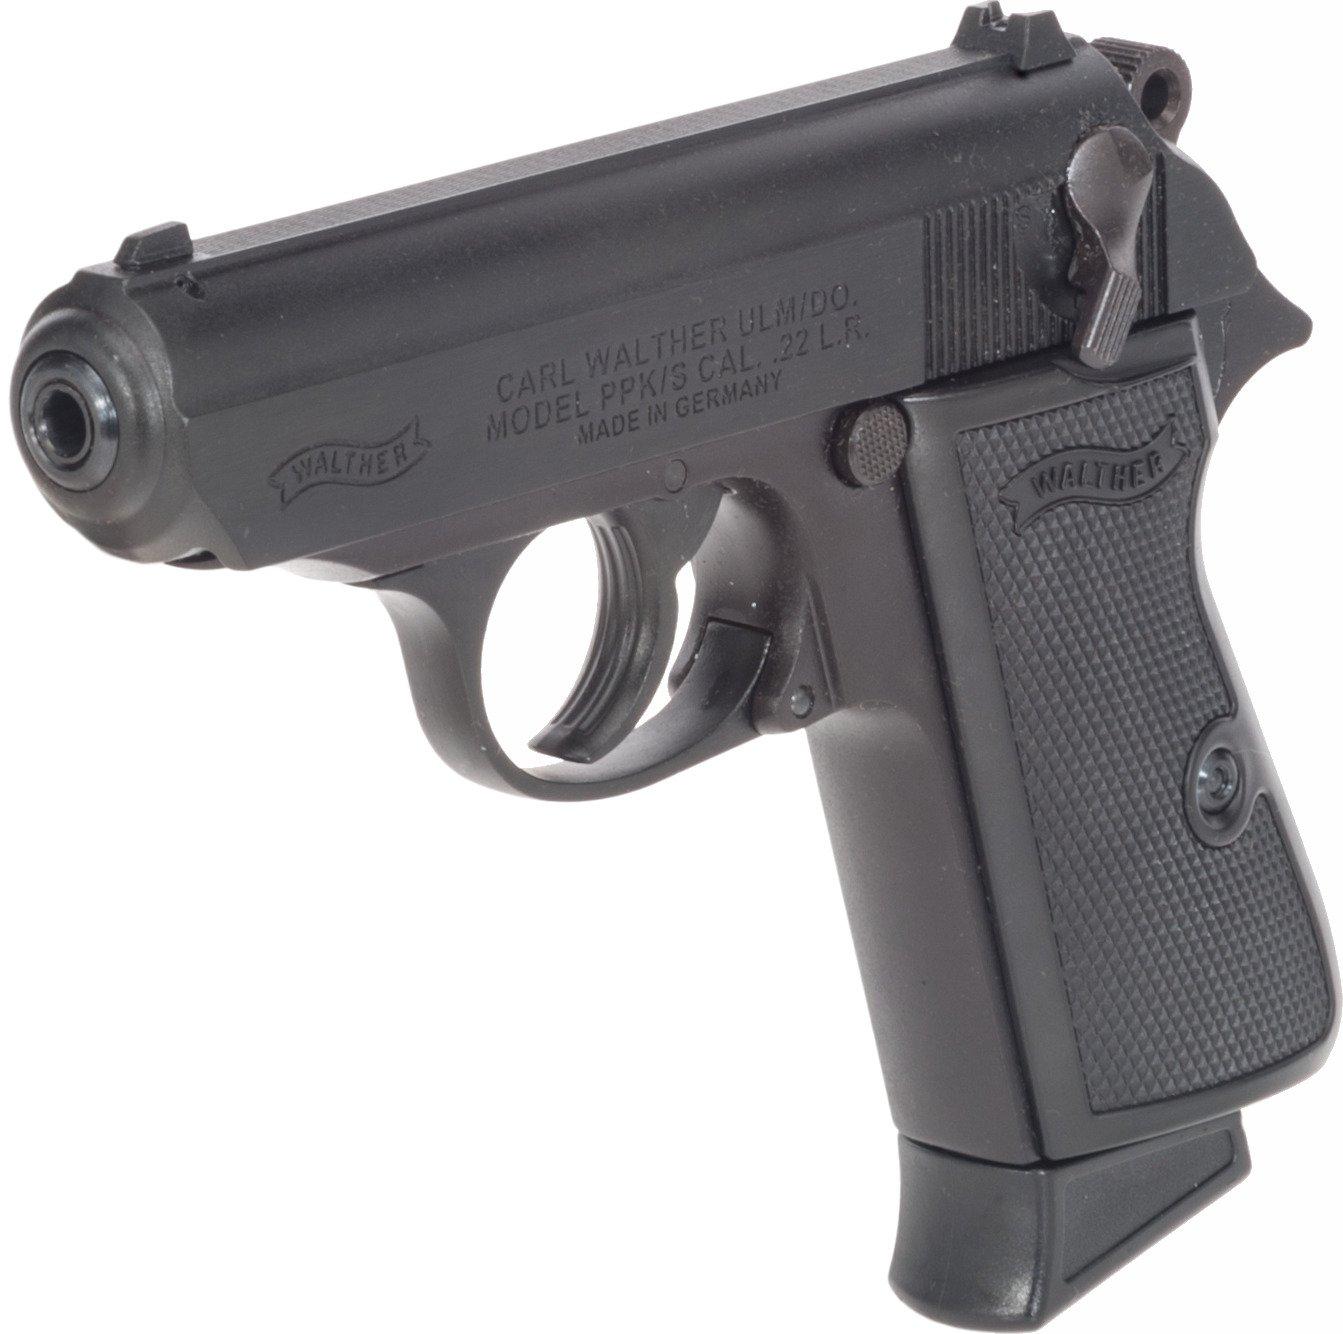 walther ppk air gun repair manual sample user manual u2022 rh userguideme today Walther PPK a Gas Handguns Walther PPK S